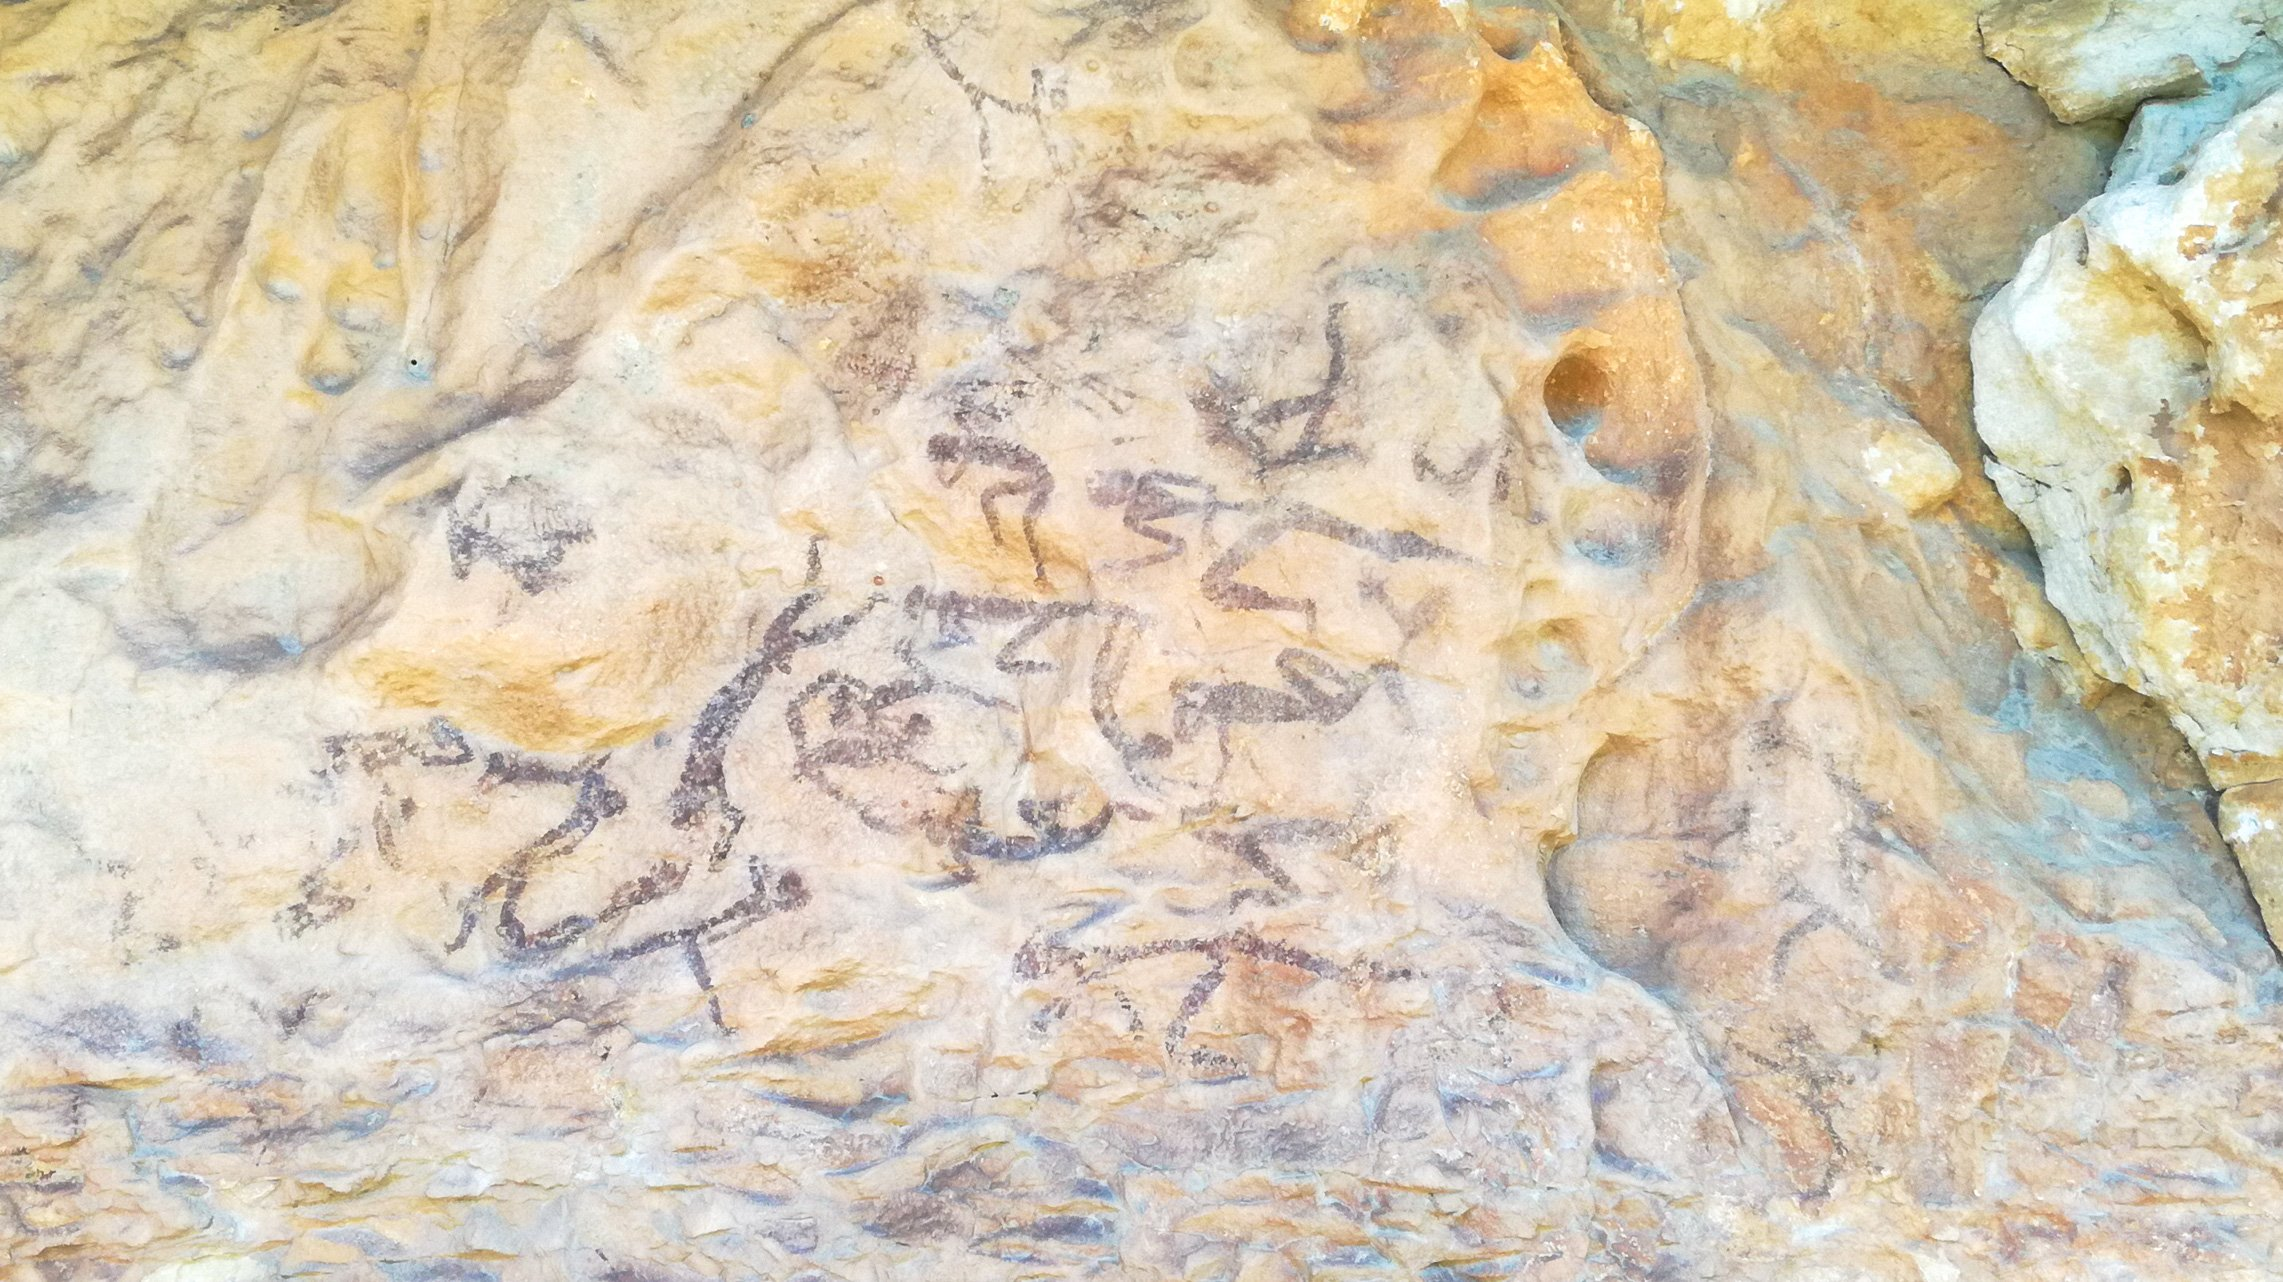 Barranc de la Vall II. UNESCO Prehistoric rock art site, Priorat